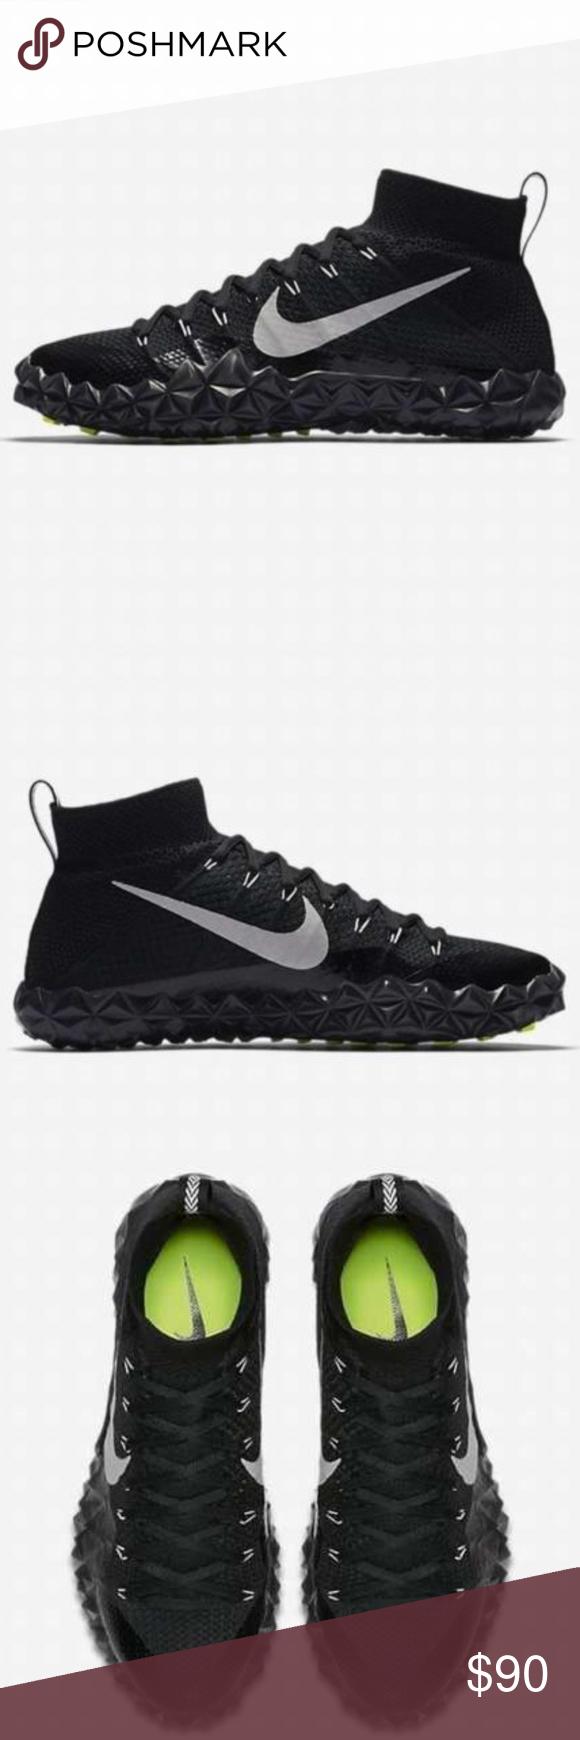 78a8dfc8251 Nike Alpha Sensory Turf Football Shoes NEW Nike Alpha Sensory Turf Football  Shoes Black Silver White 854312-001 Nike Shoes Athletic Shoes